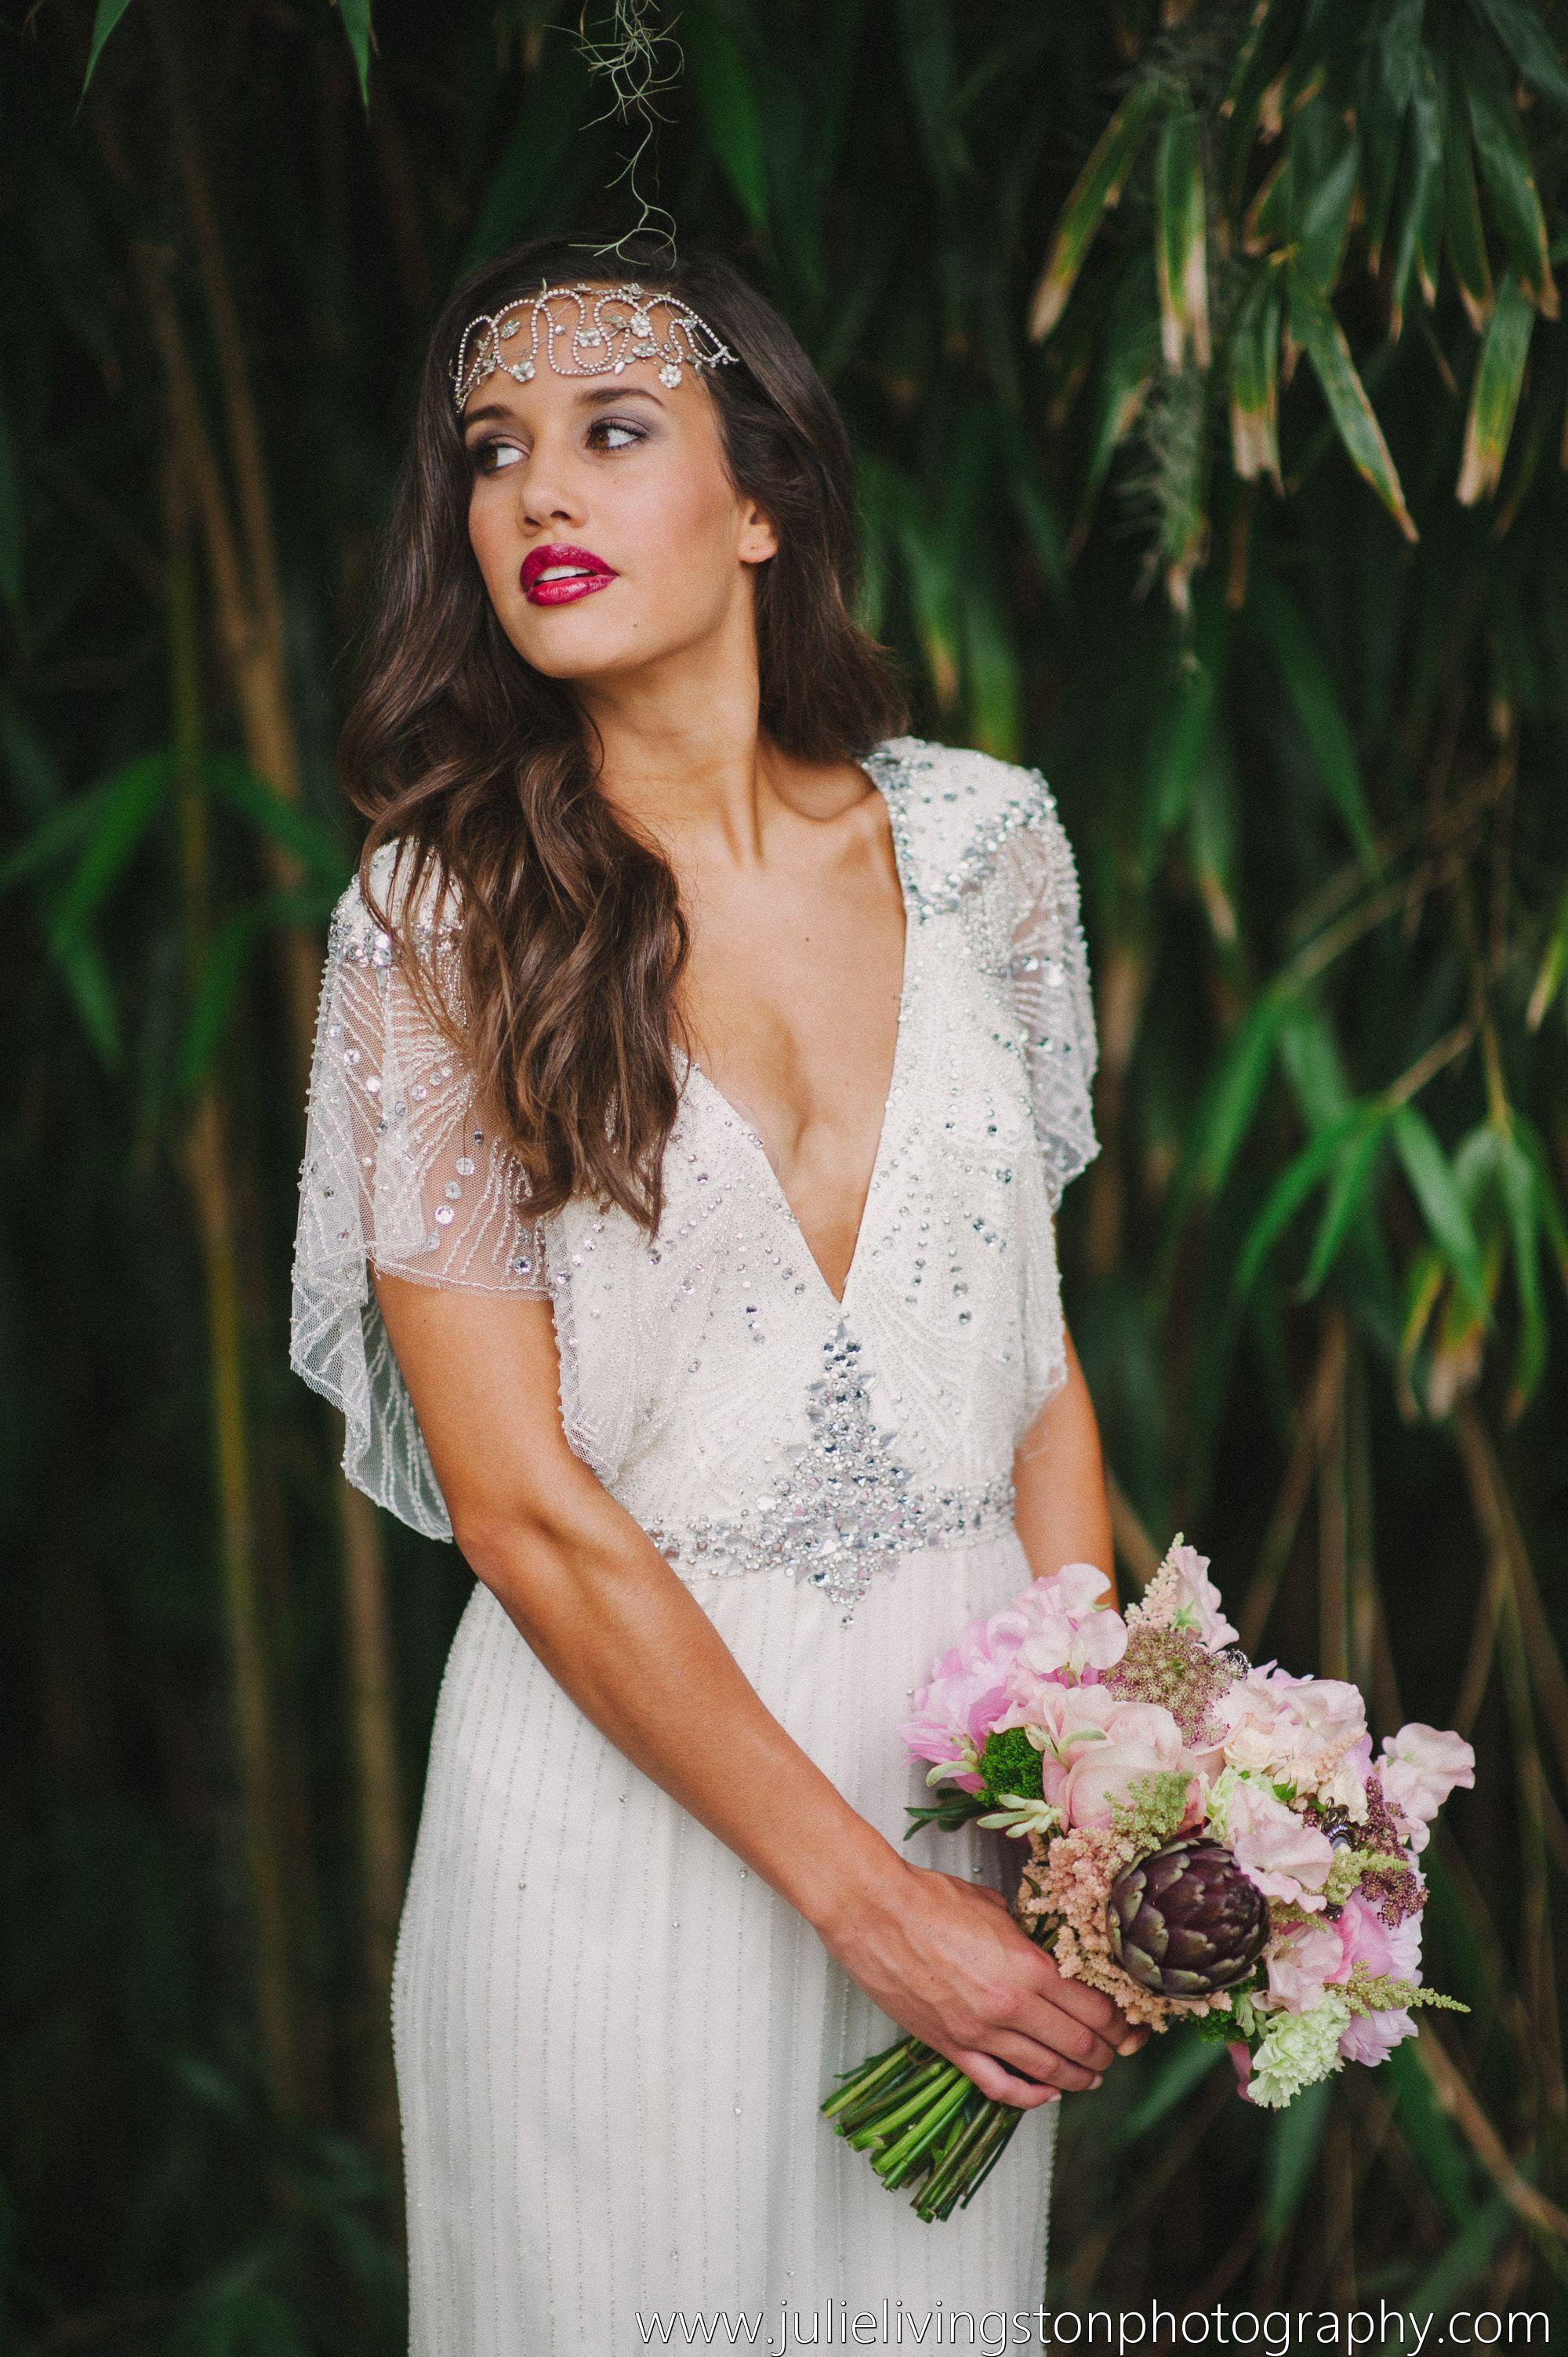 Julie Livingston Photography | Dress: Jenny Packham | yes ...